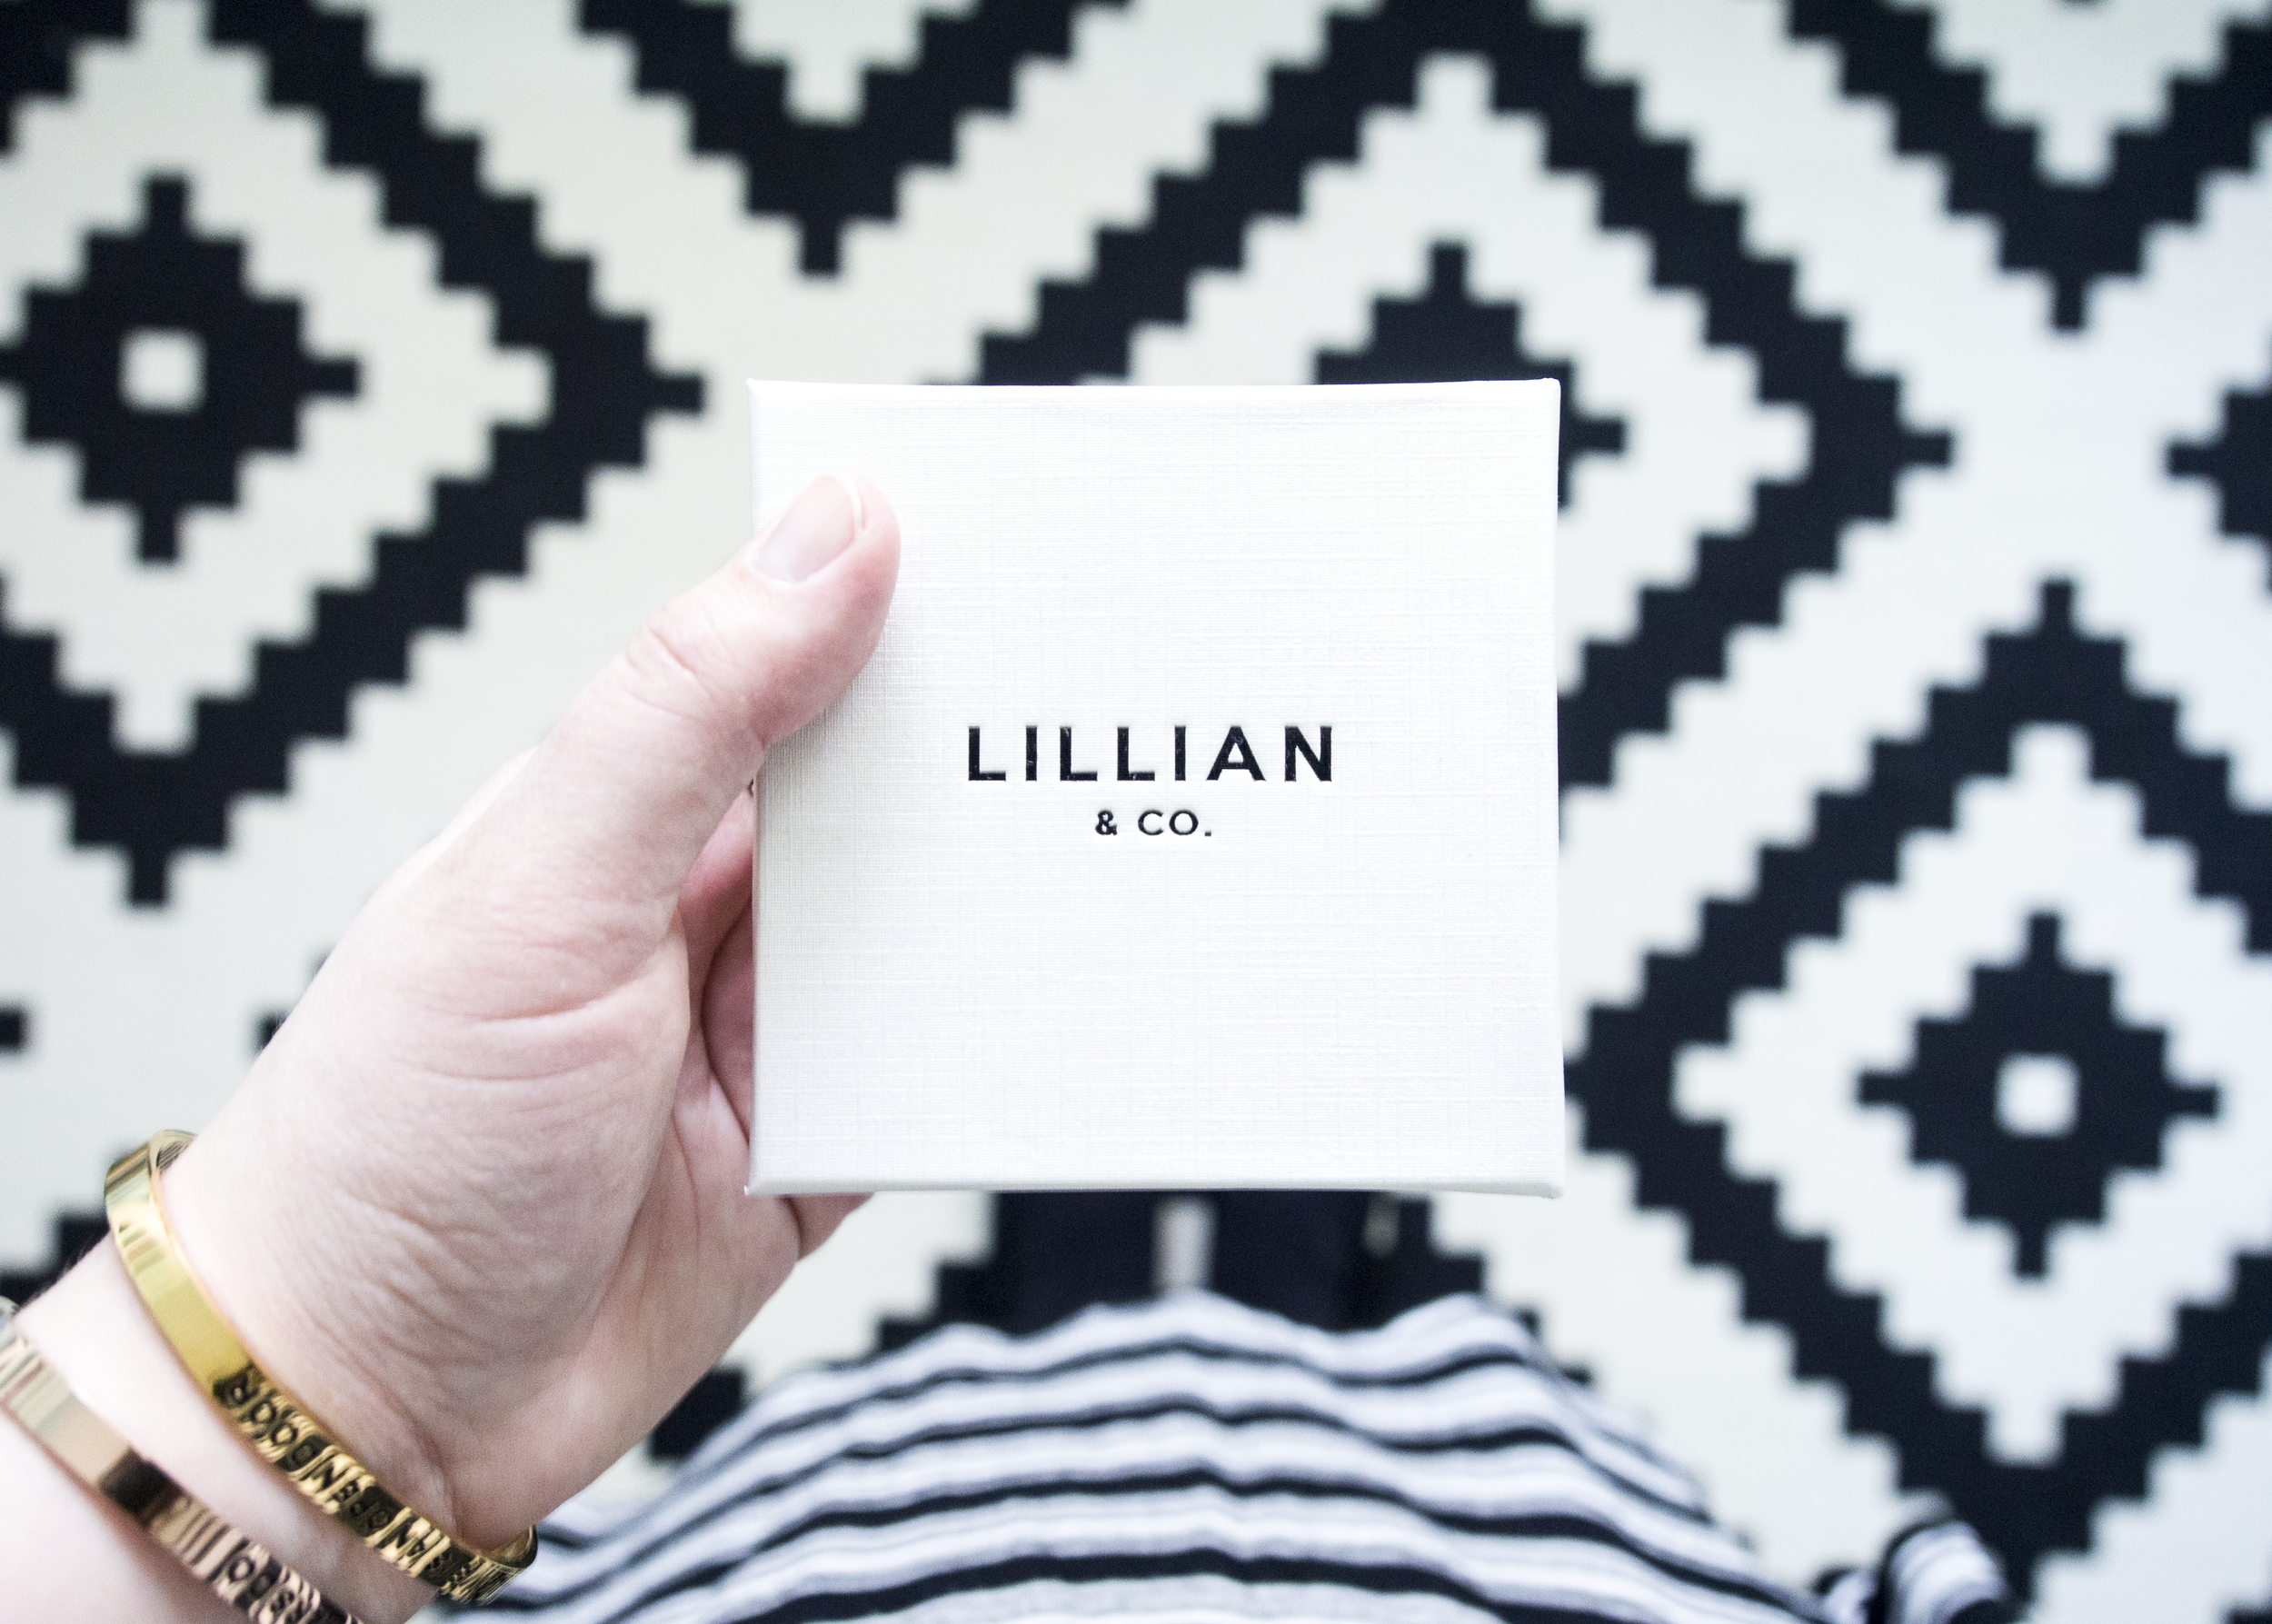 LillianCo.png